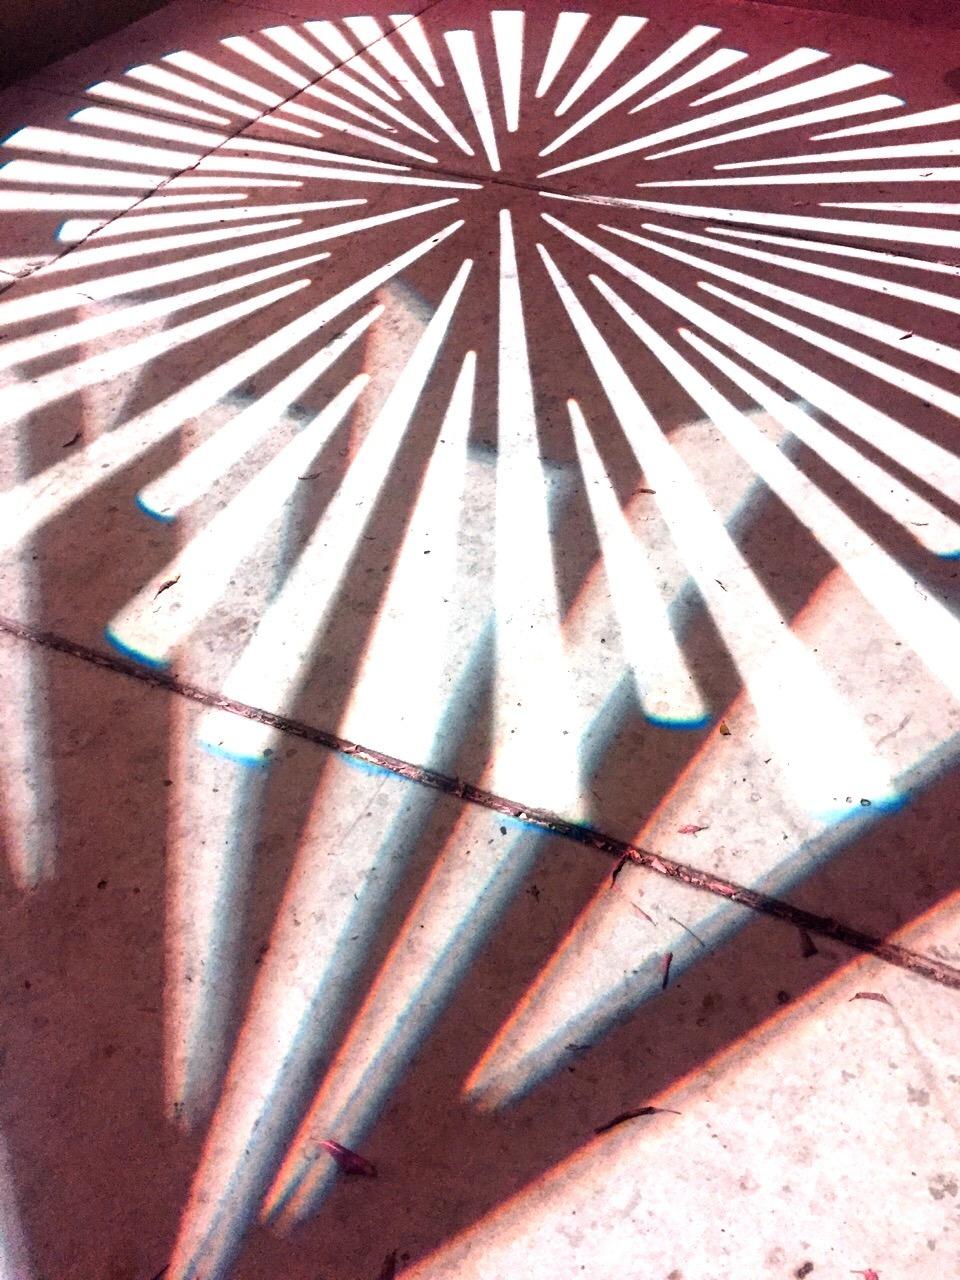 Light shaping.